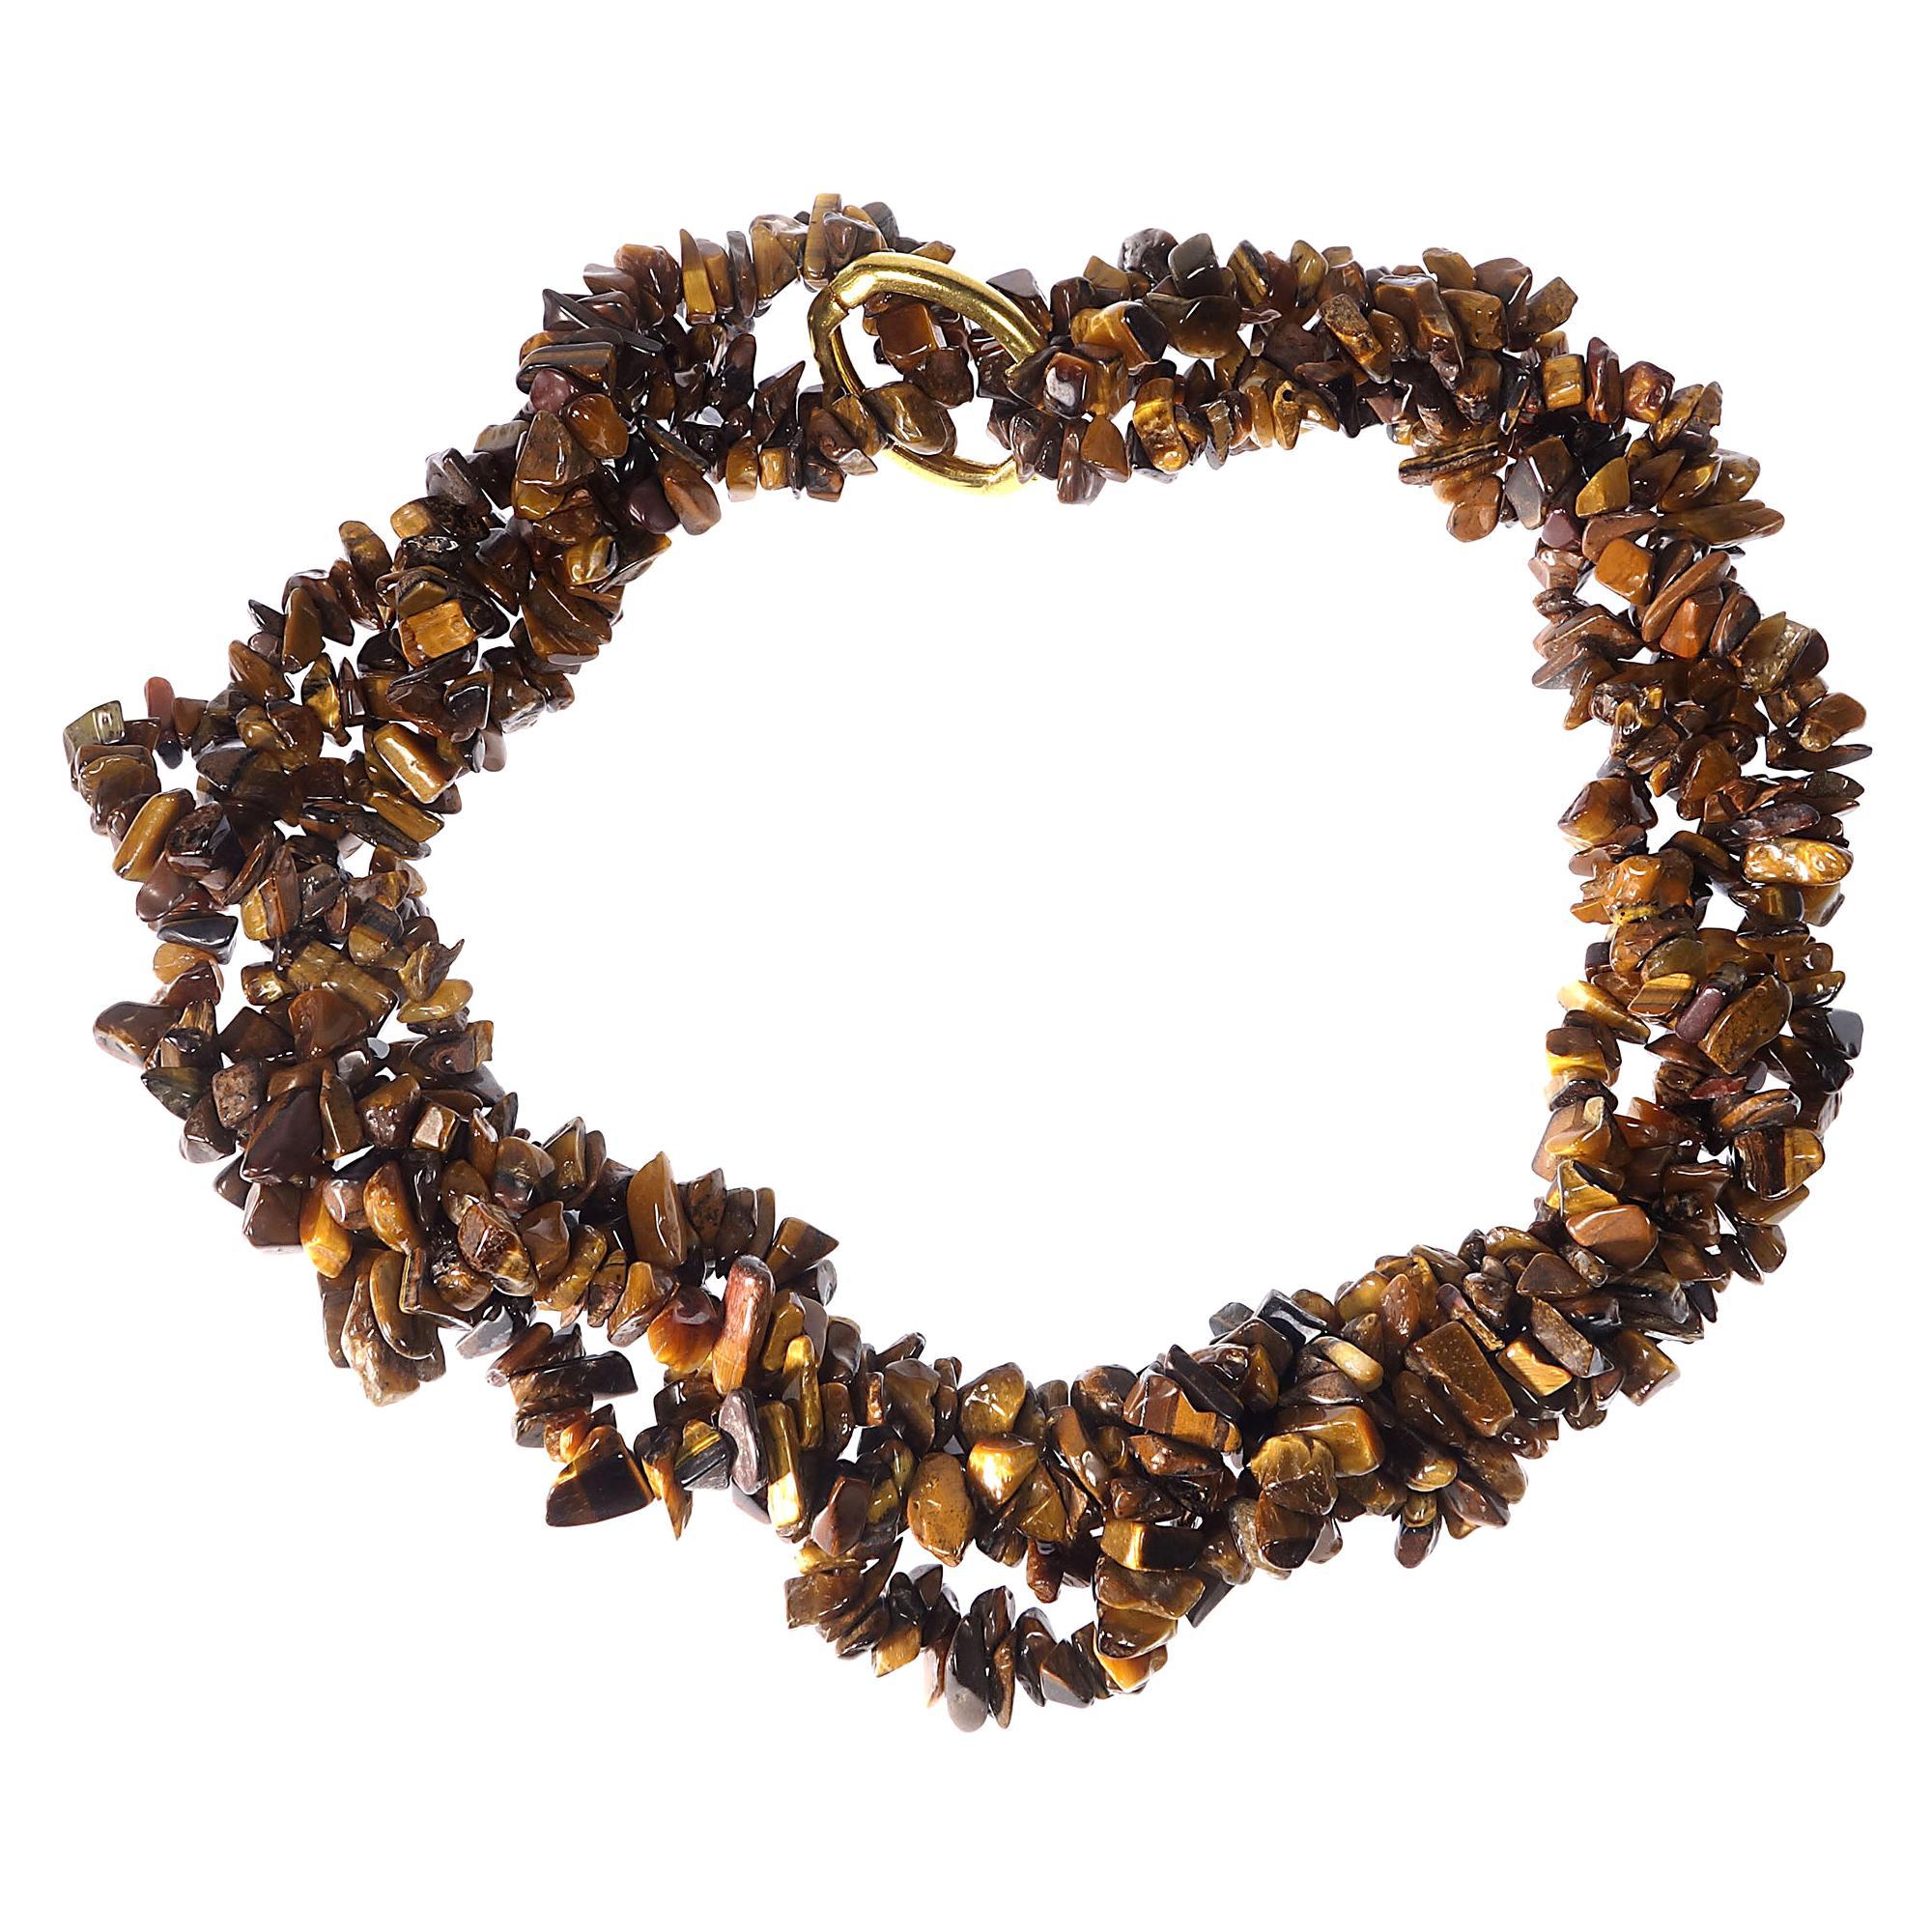 Fashion Jewelry Choker Necklaces